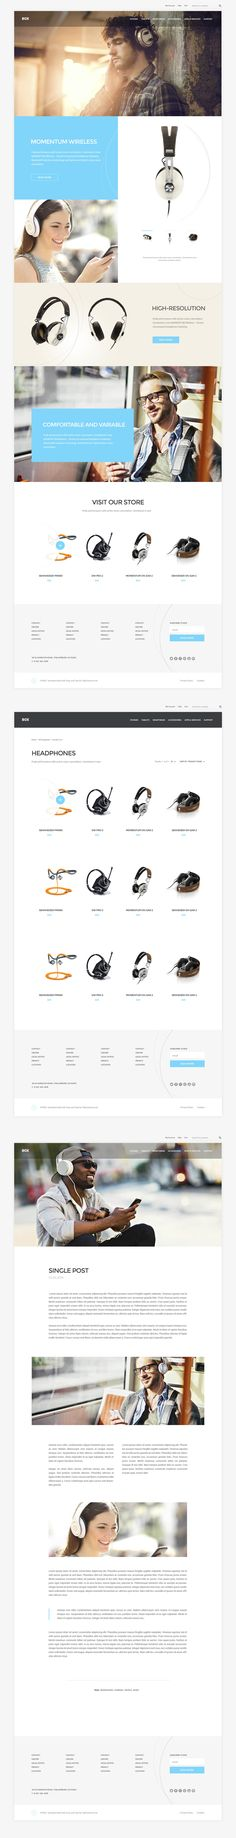 BOX - Brand-building eCommerce WordPress Theme